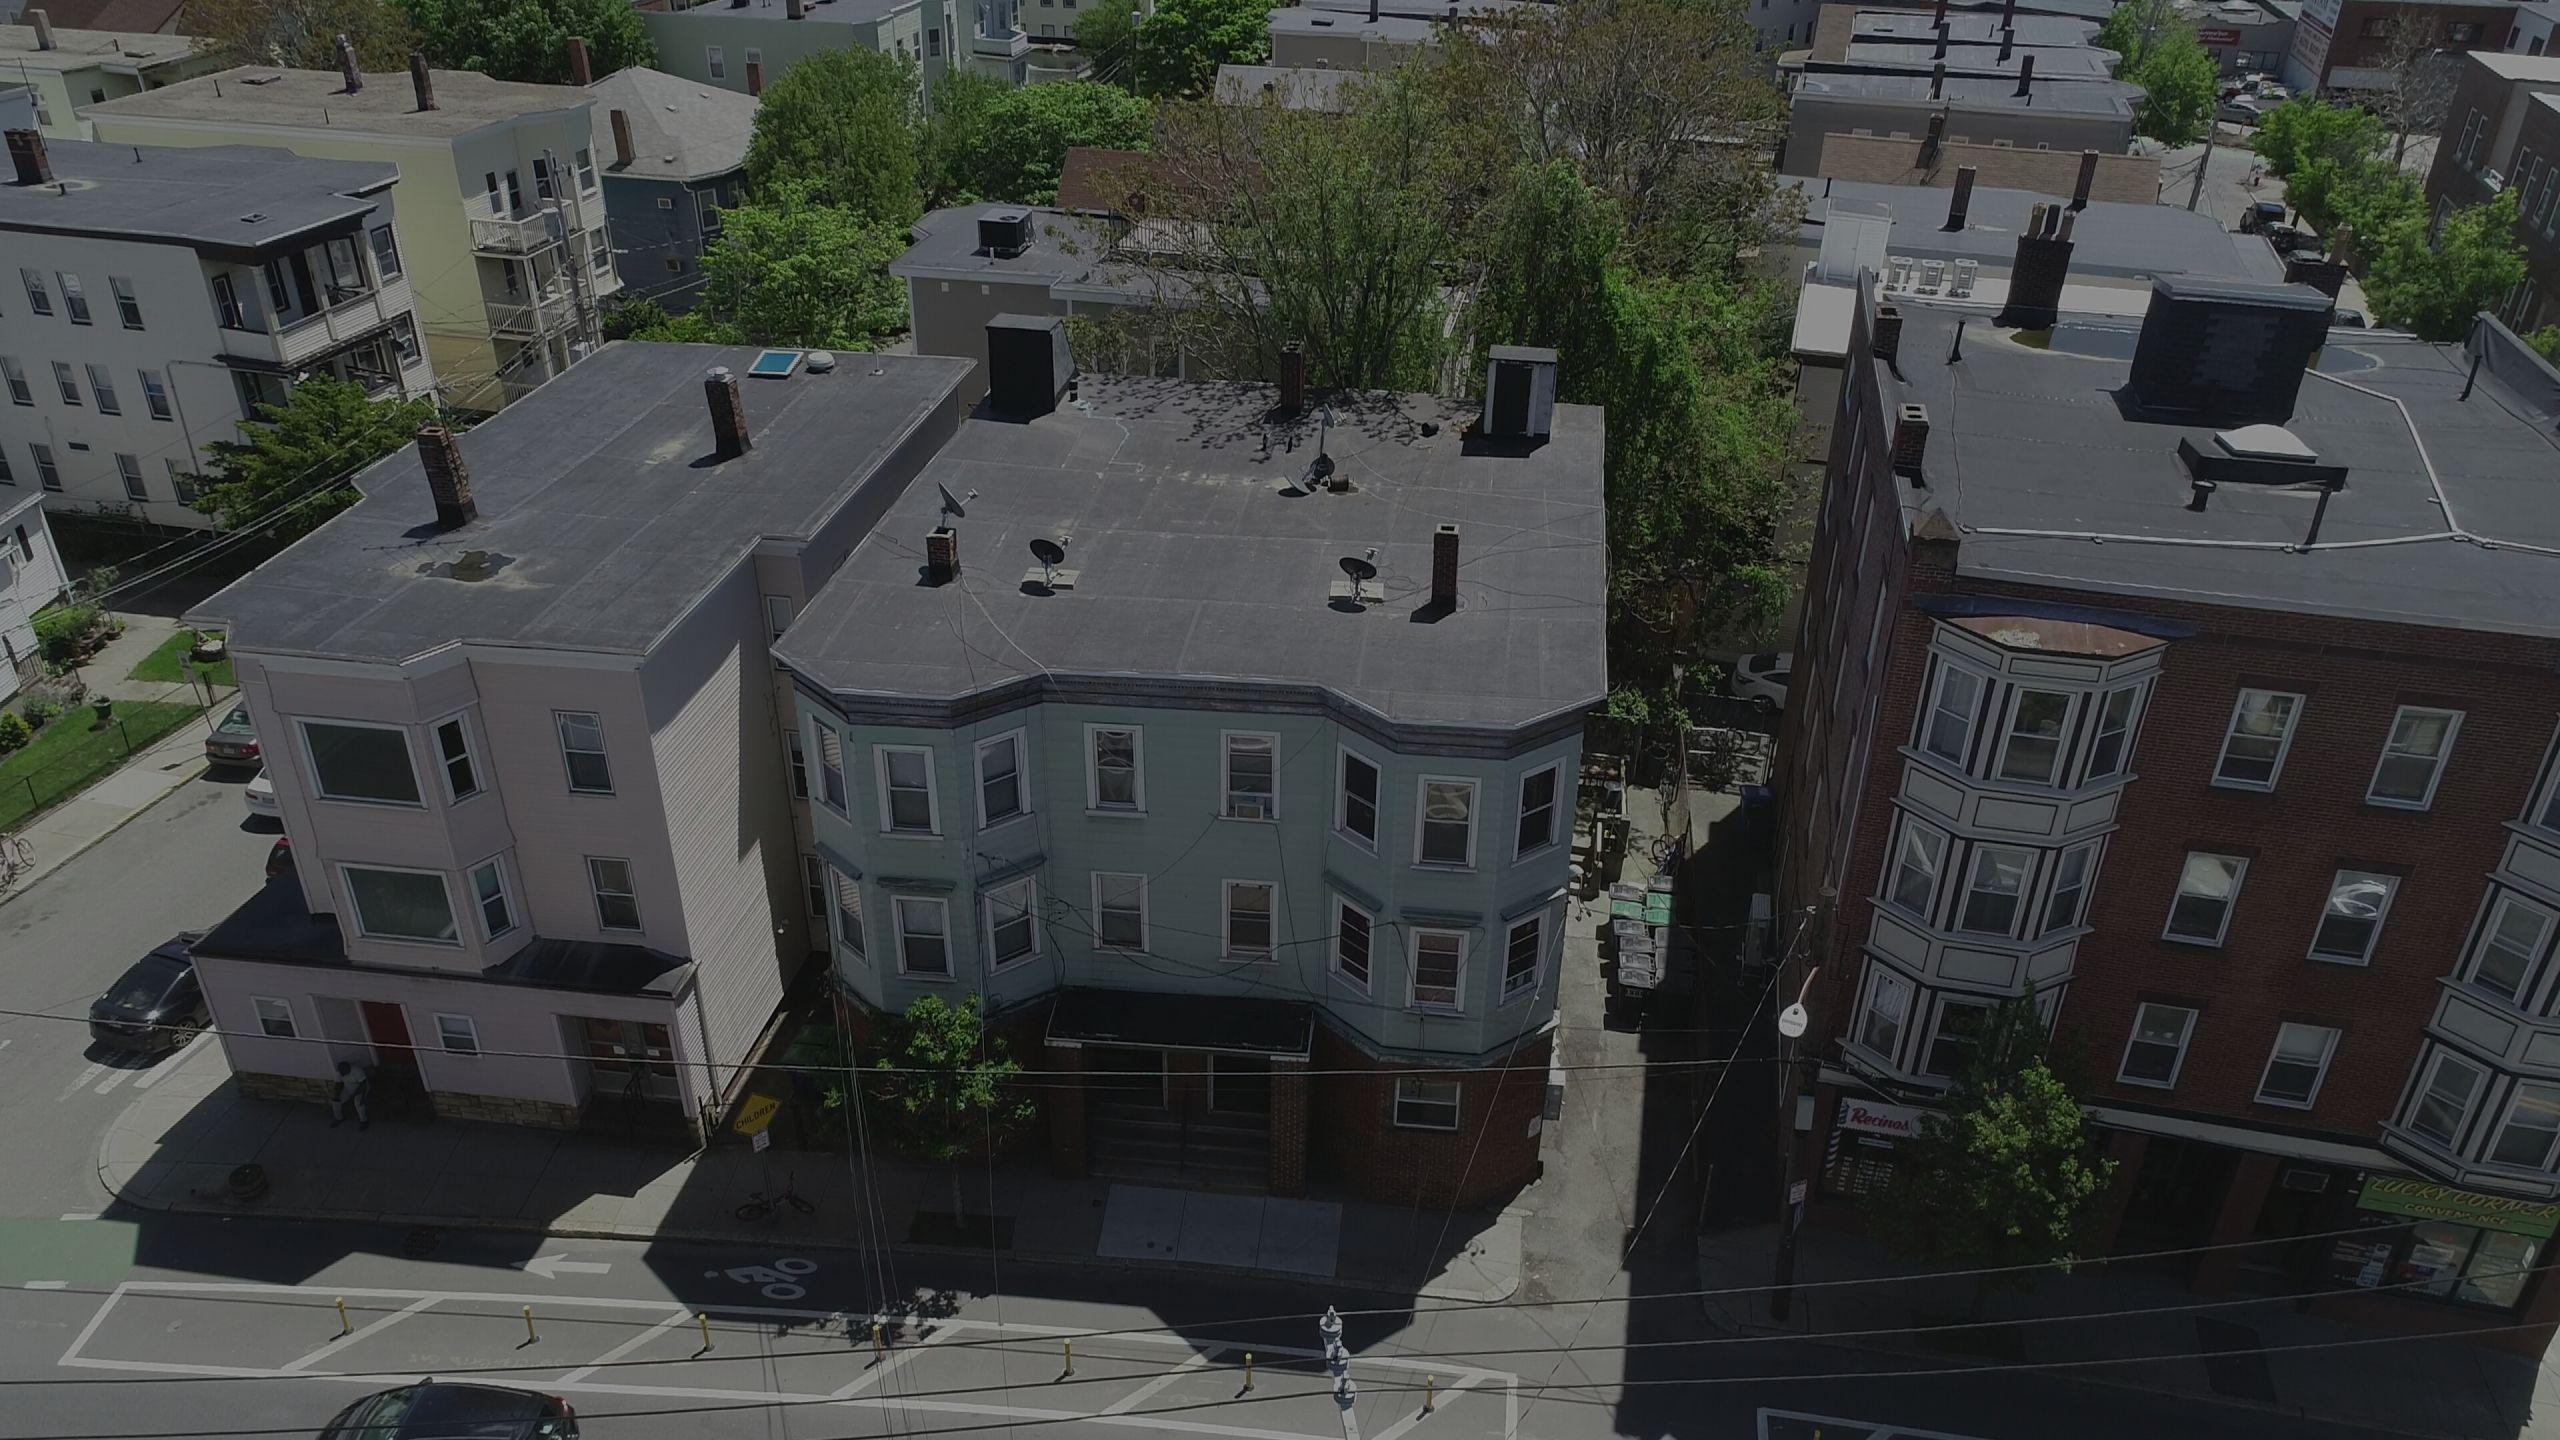 204-206 Washington Street